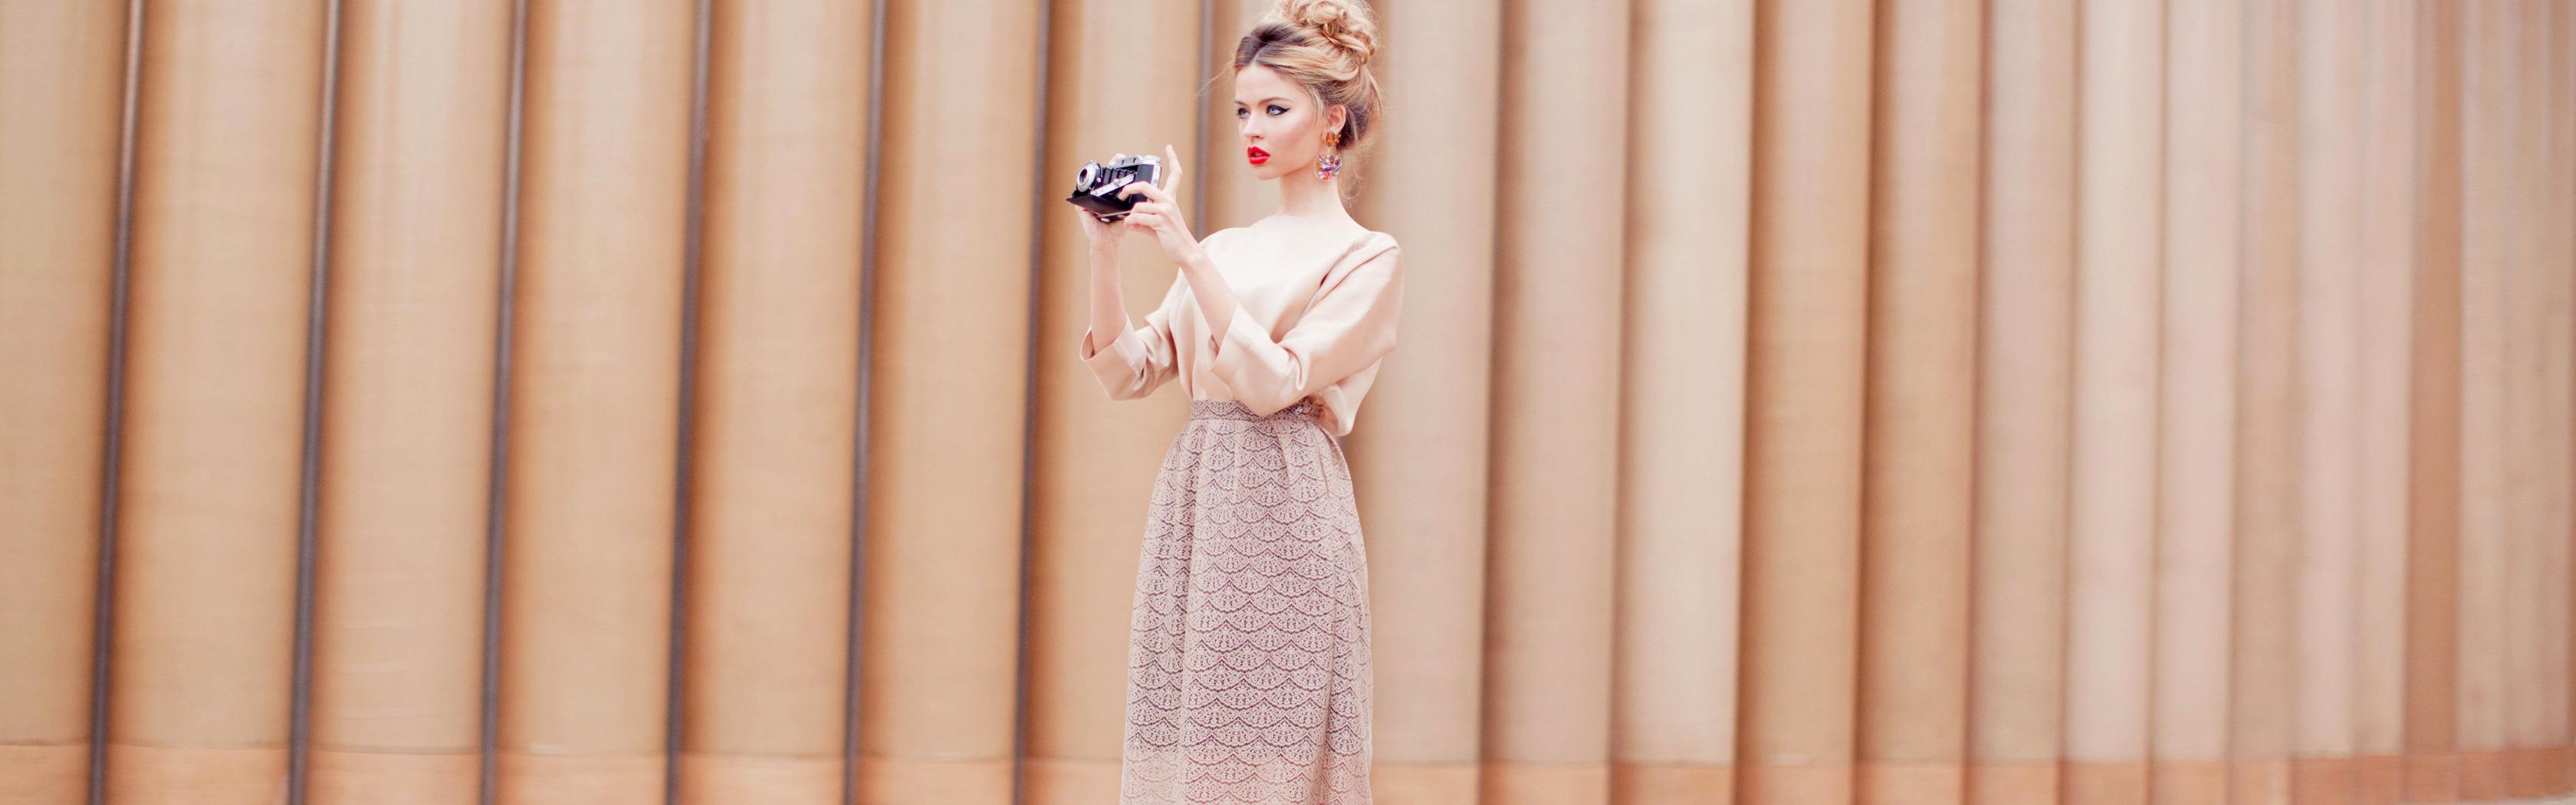 Блондинка снимает юбку